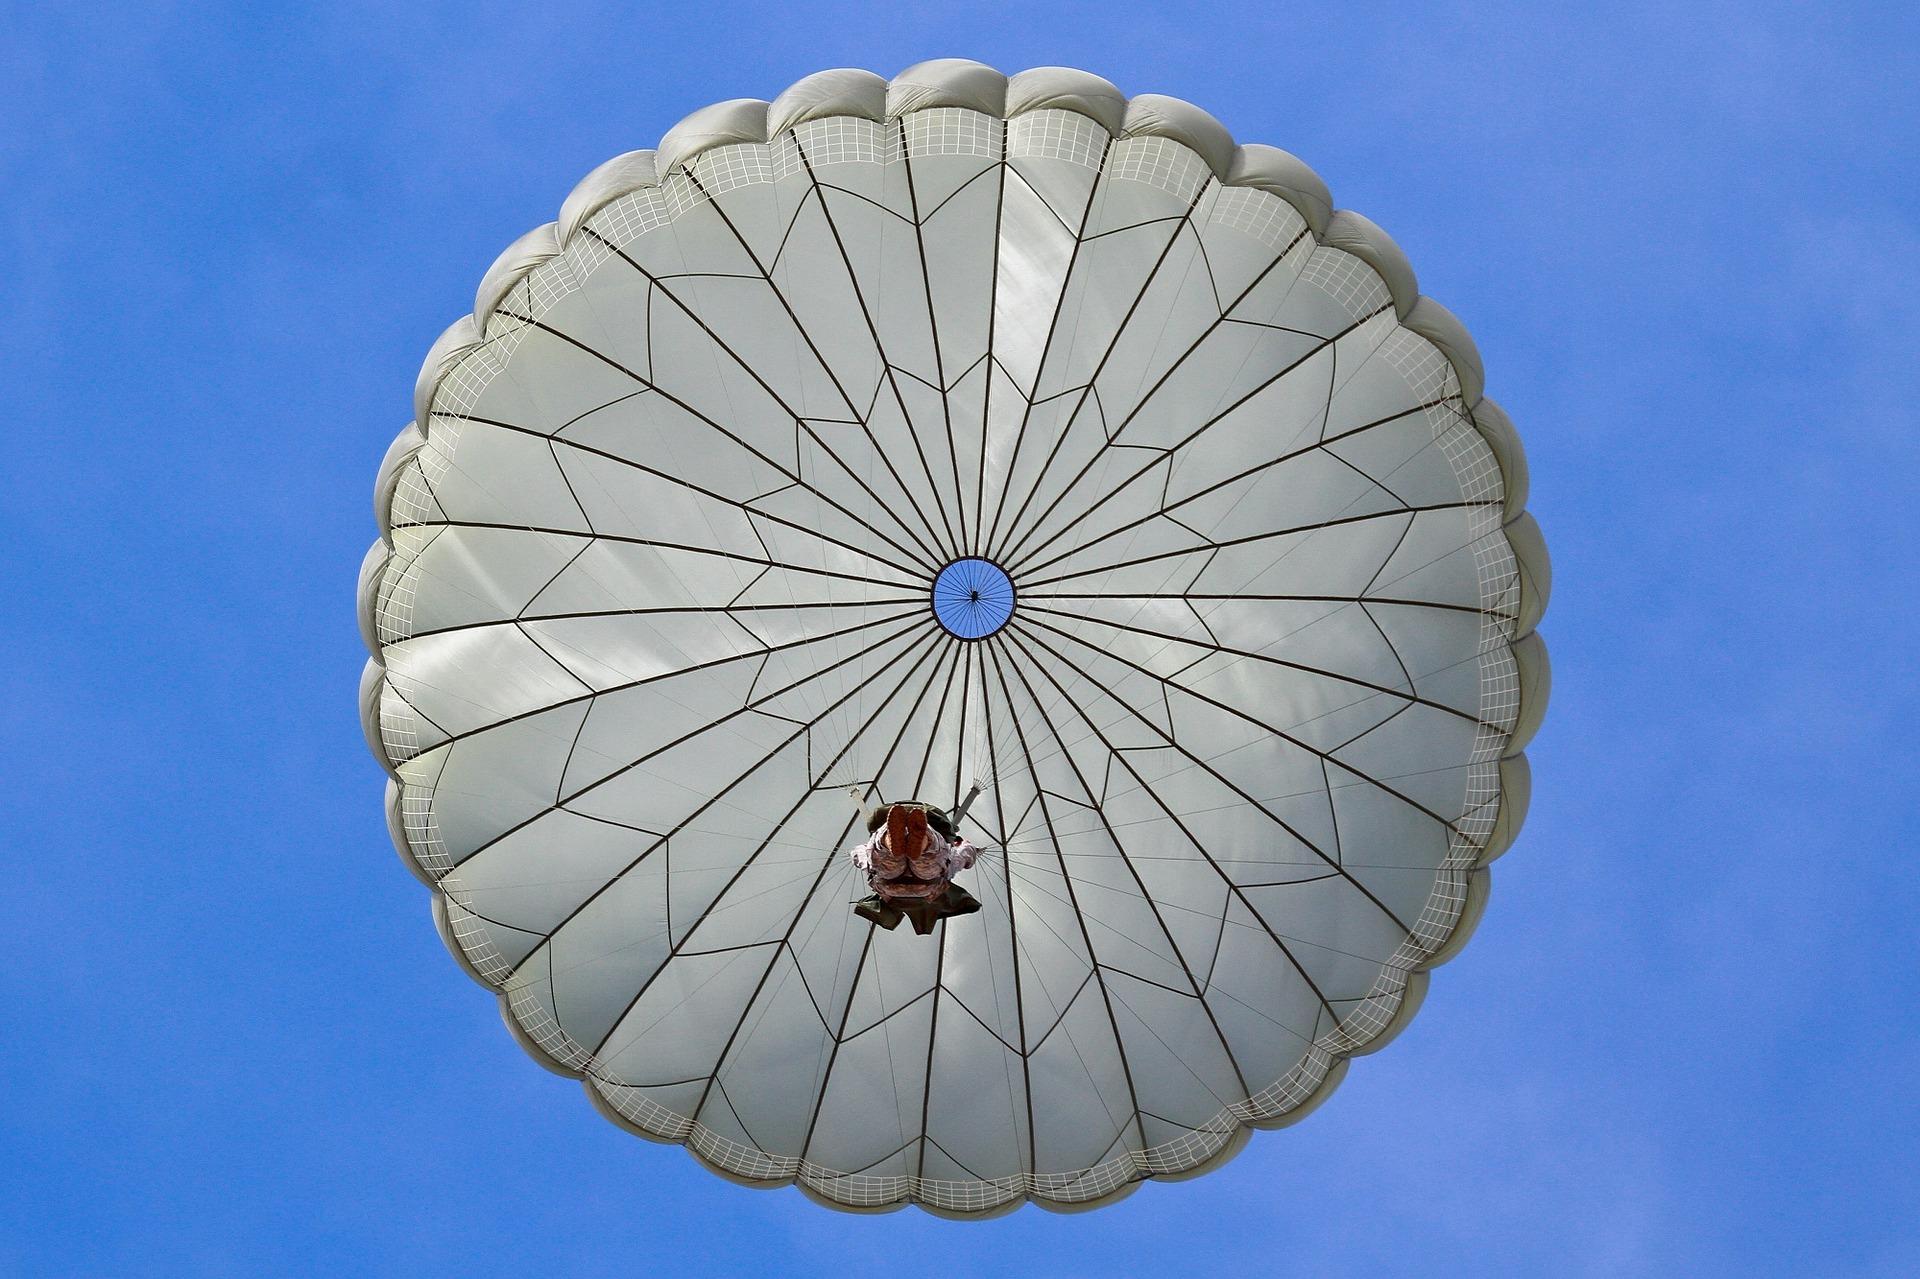 Parachute pixabay